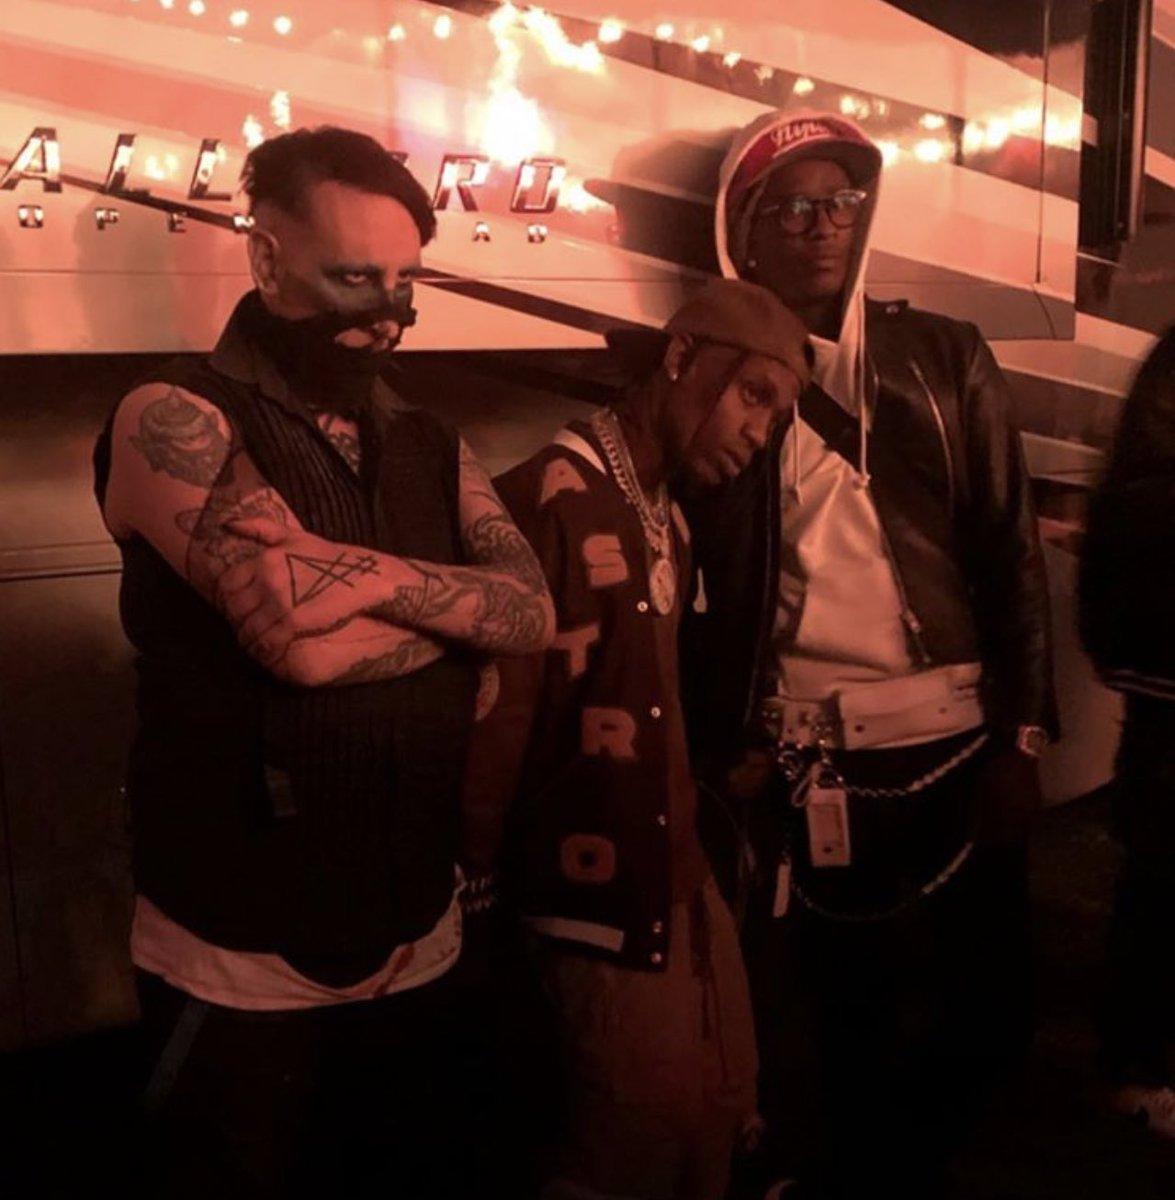 Marilyn Manson, Travis Scott, & Young Thug #ASTROWORLDfestival